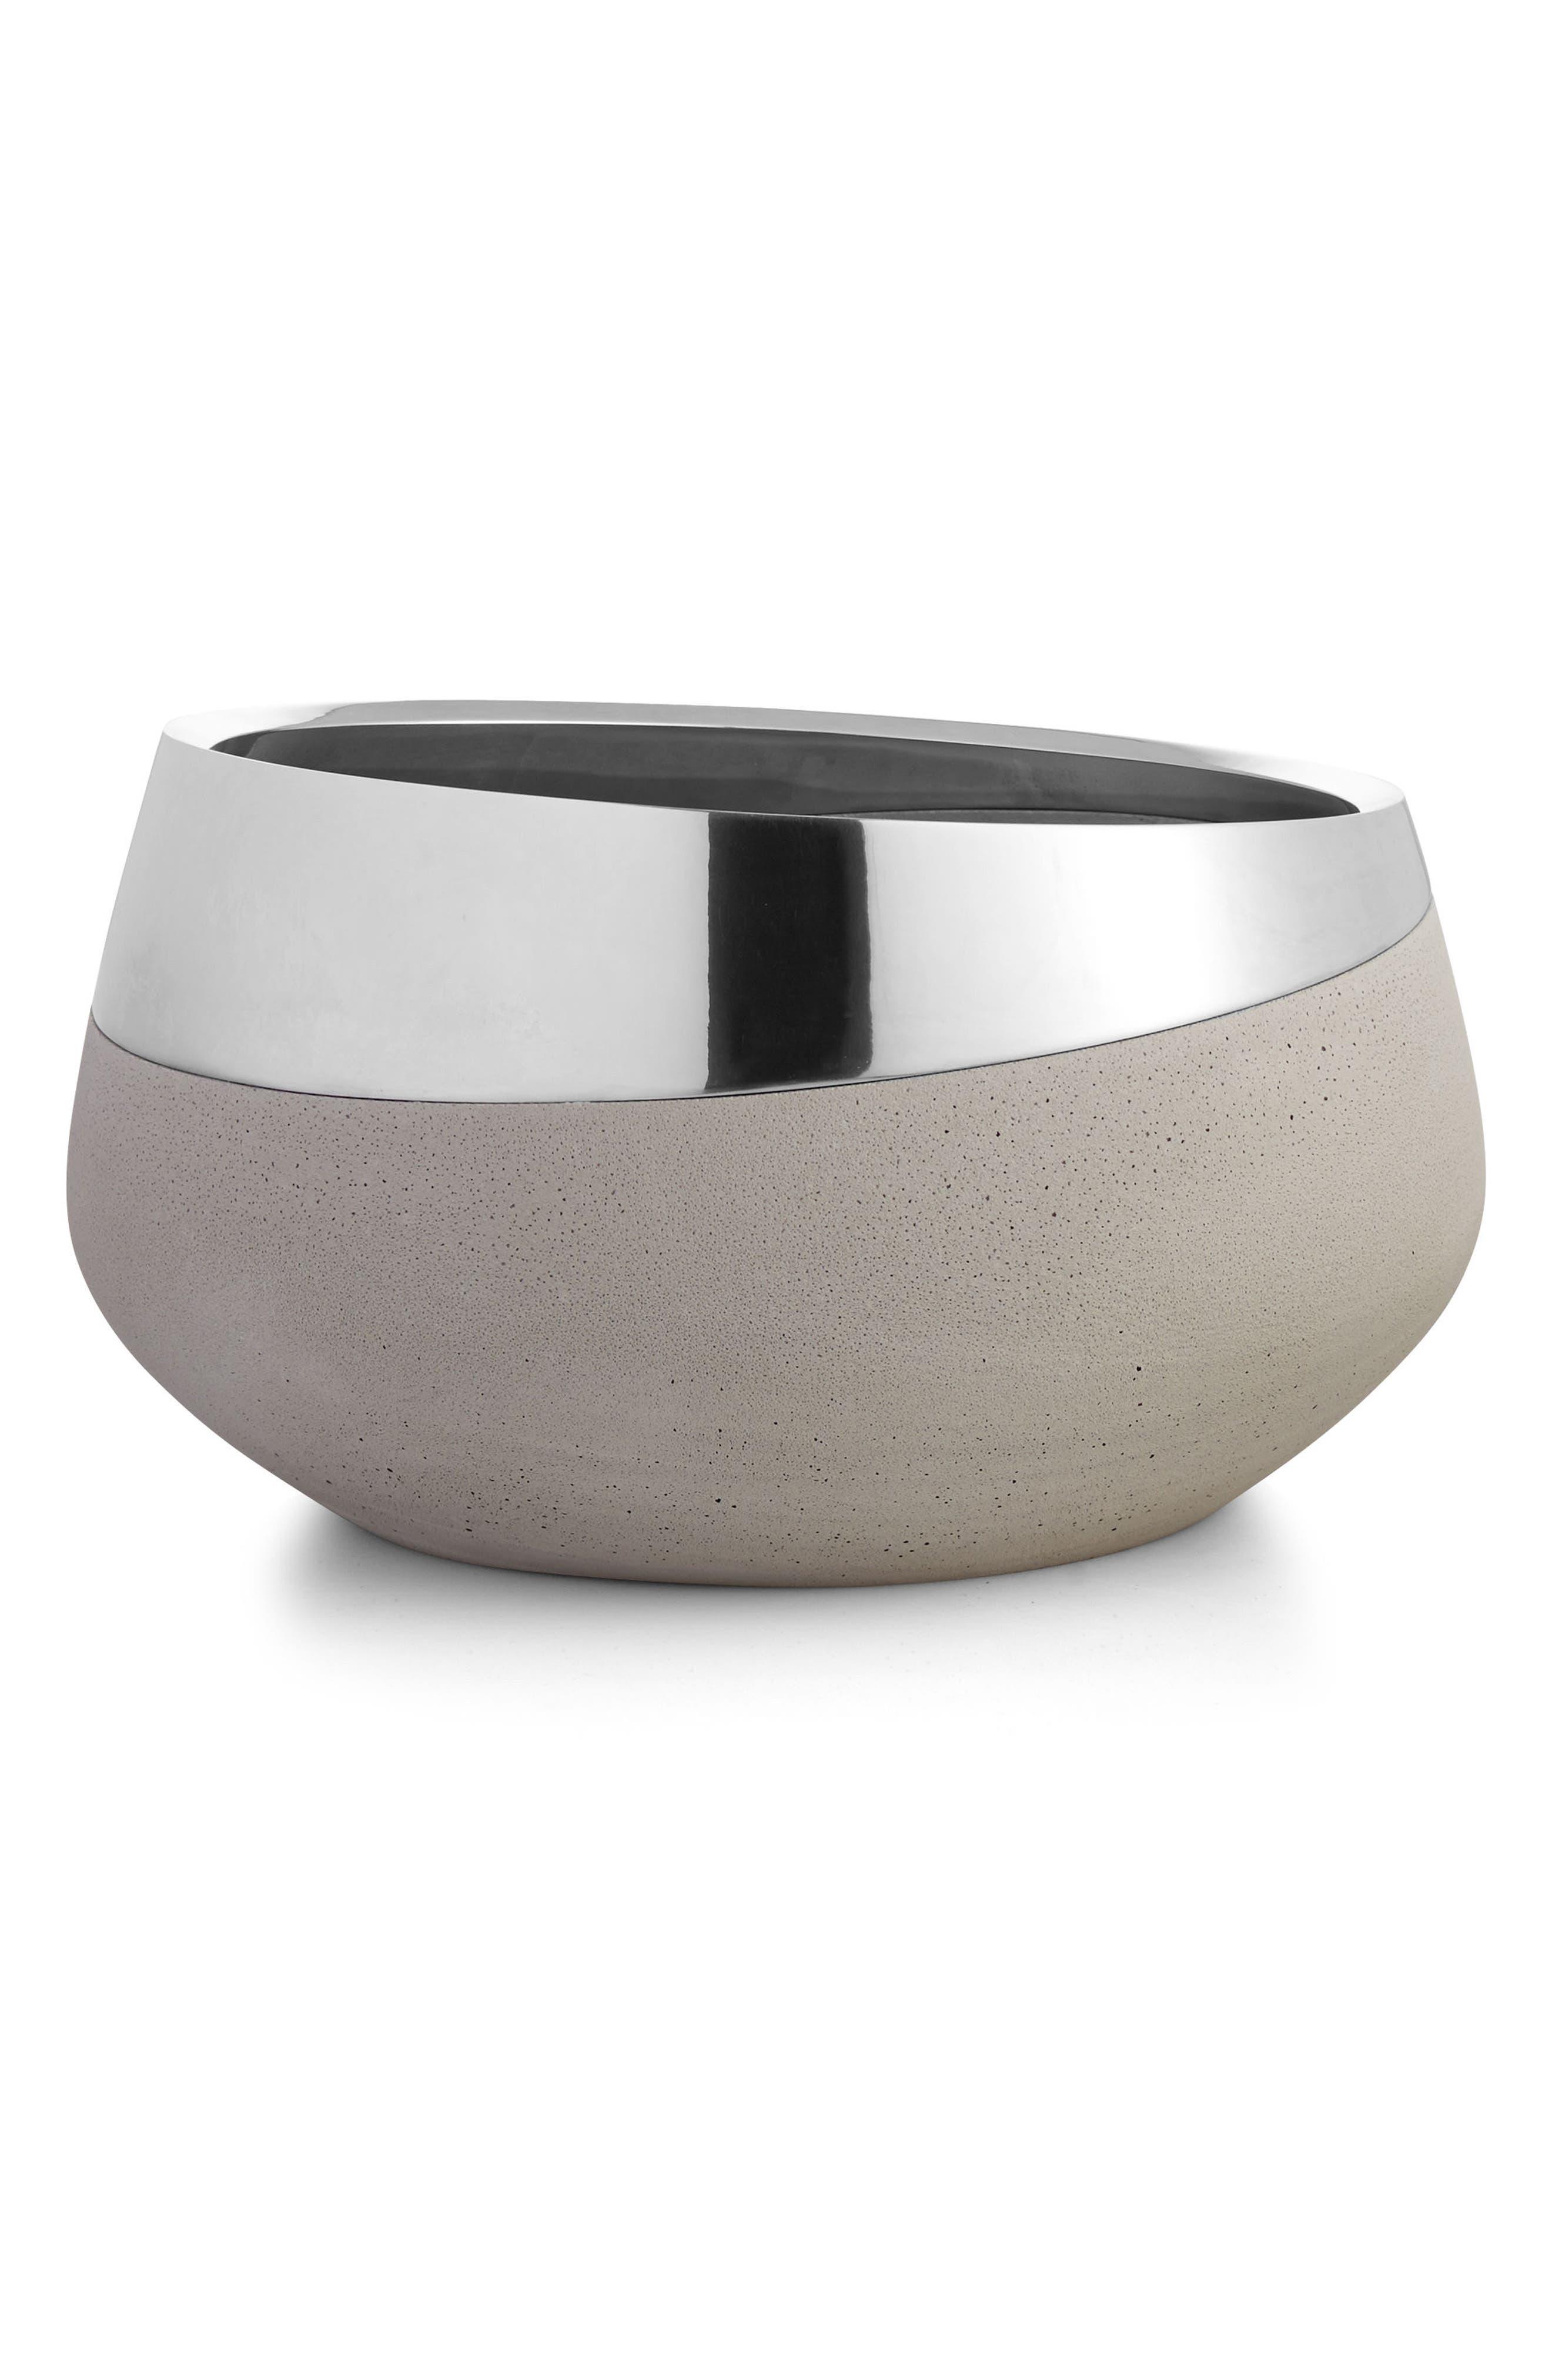 Forte Large Bowl,                             Main thumbnail 1, color,                             020